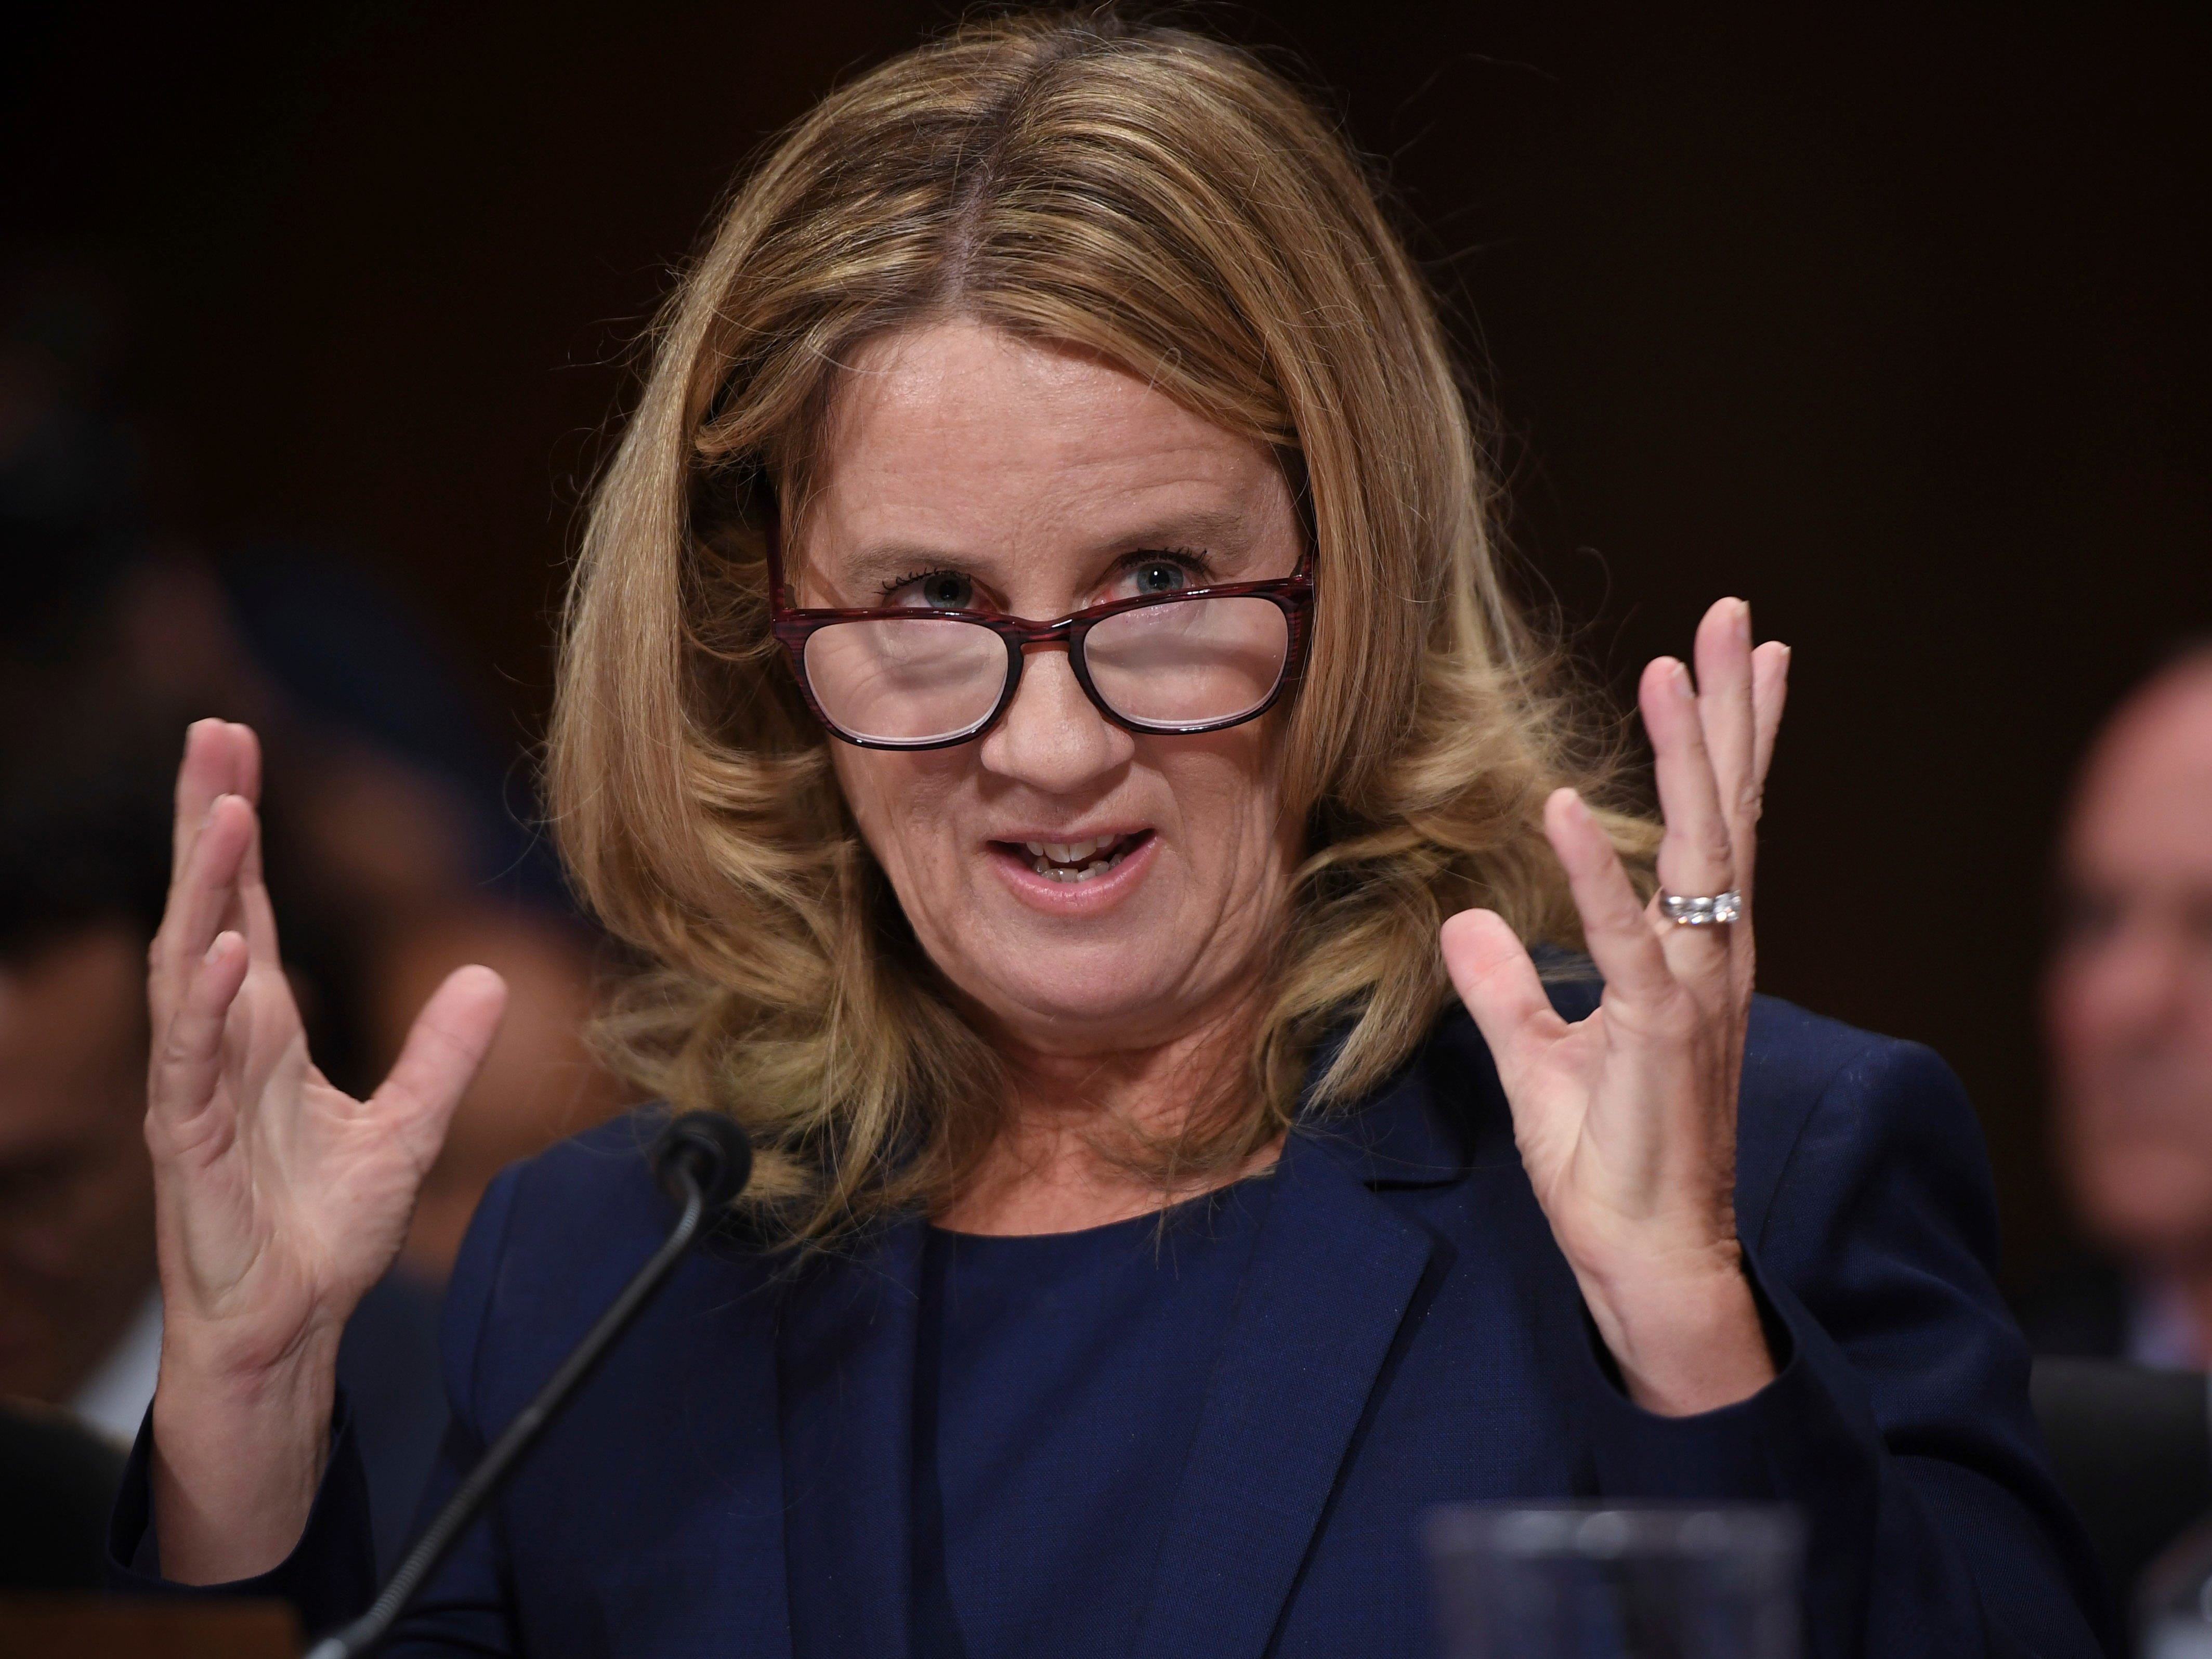 Christine Blasey Ford testifies to the Senate Judiciary Committee on Capitol Hill in Washington, Thursday, Sept. 27, 2018. (Saul Loeb/Pool Photo via AP) ORG XMIT: DCJE506